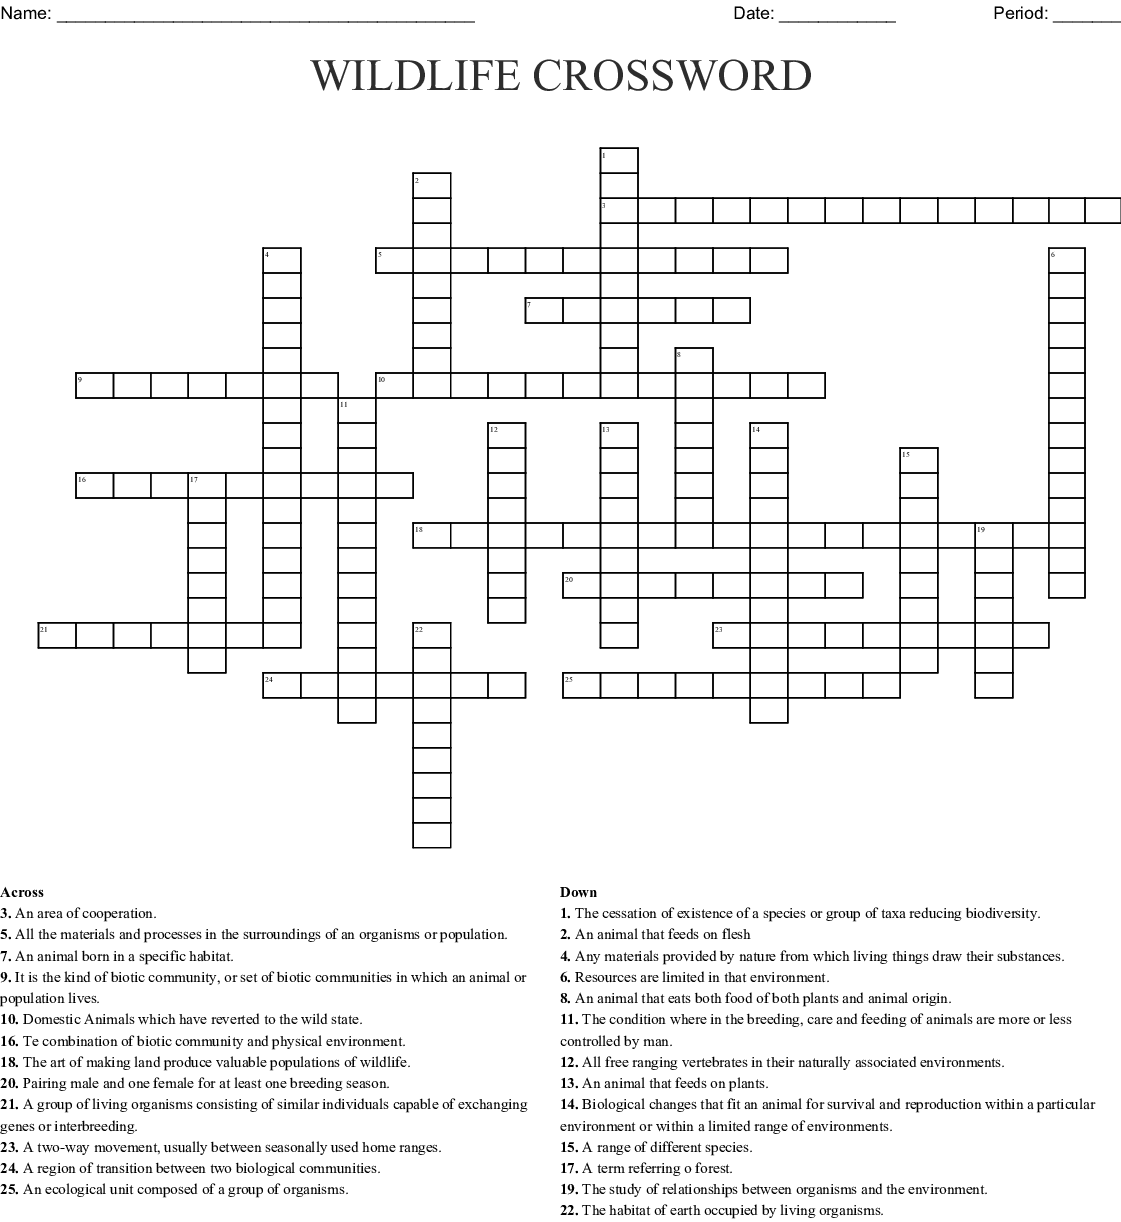 Wildlife Management Crossword